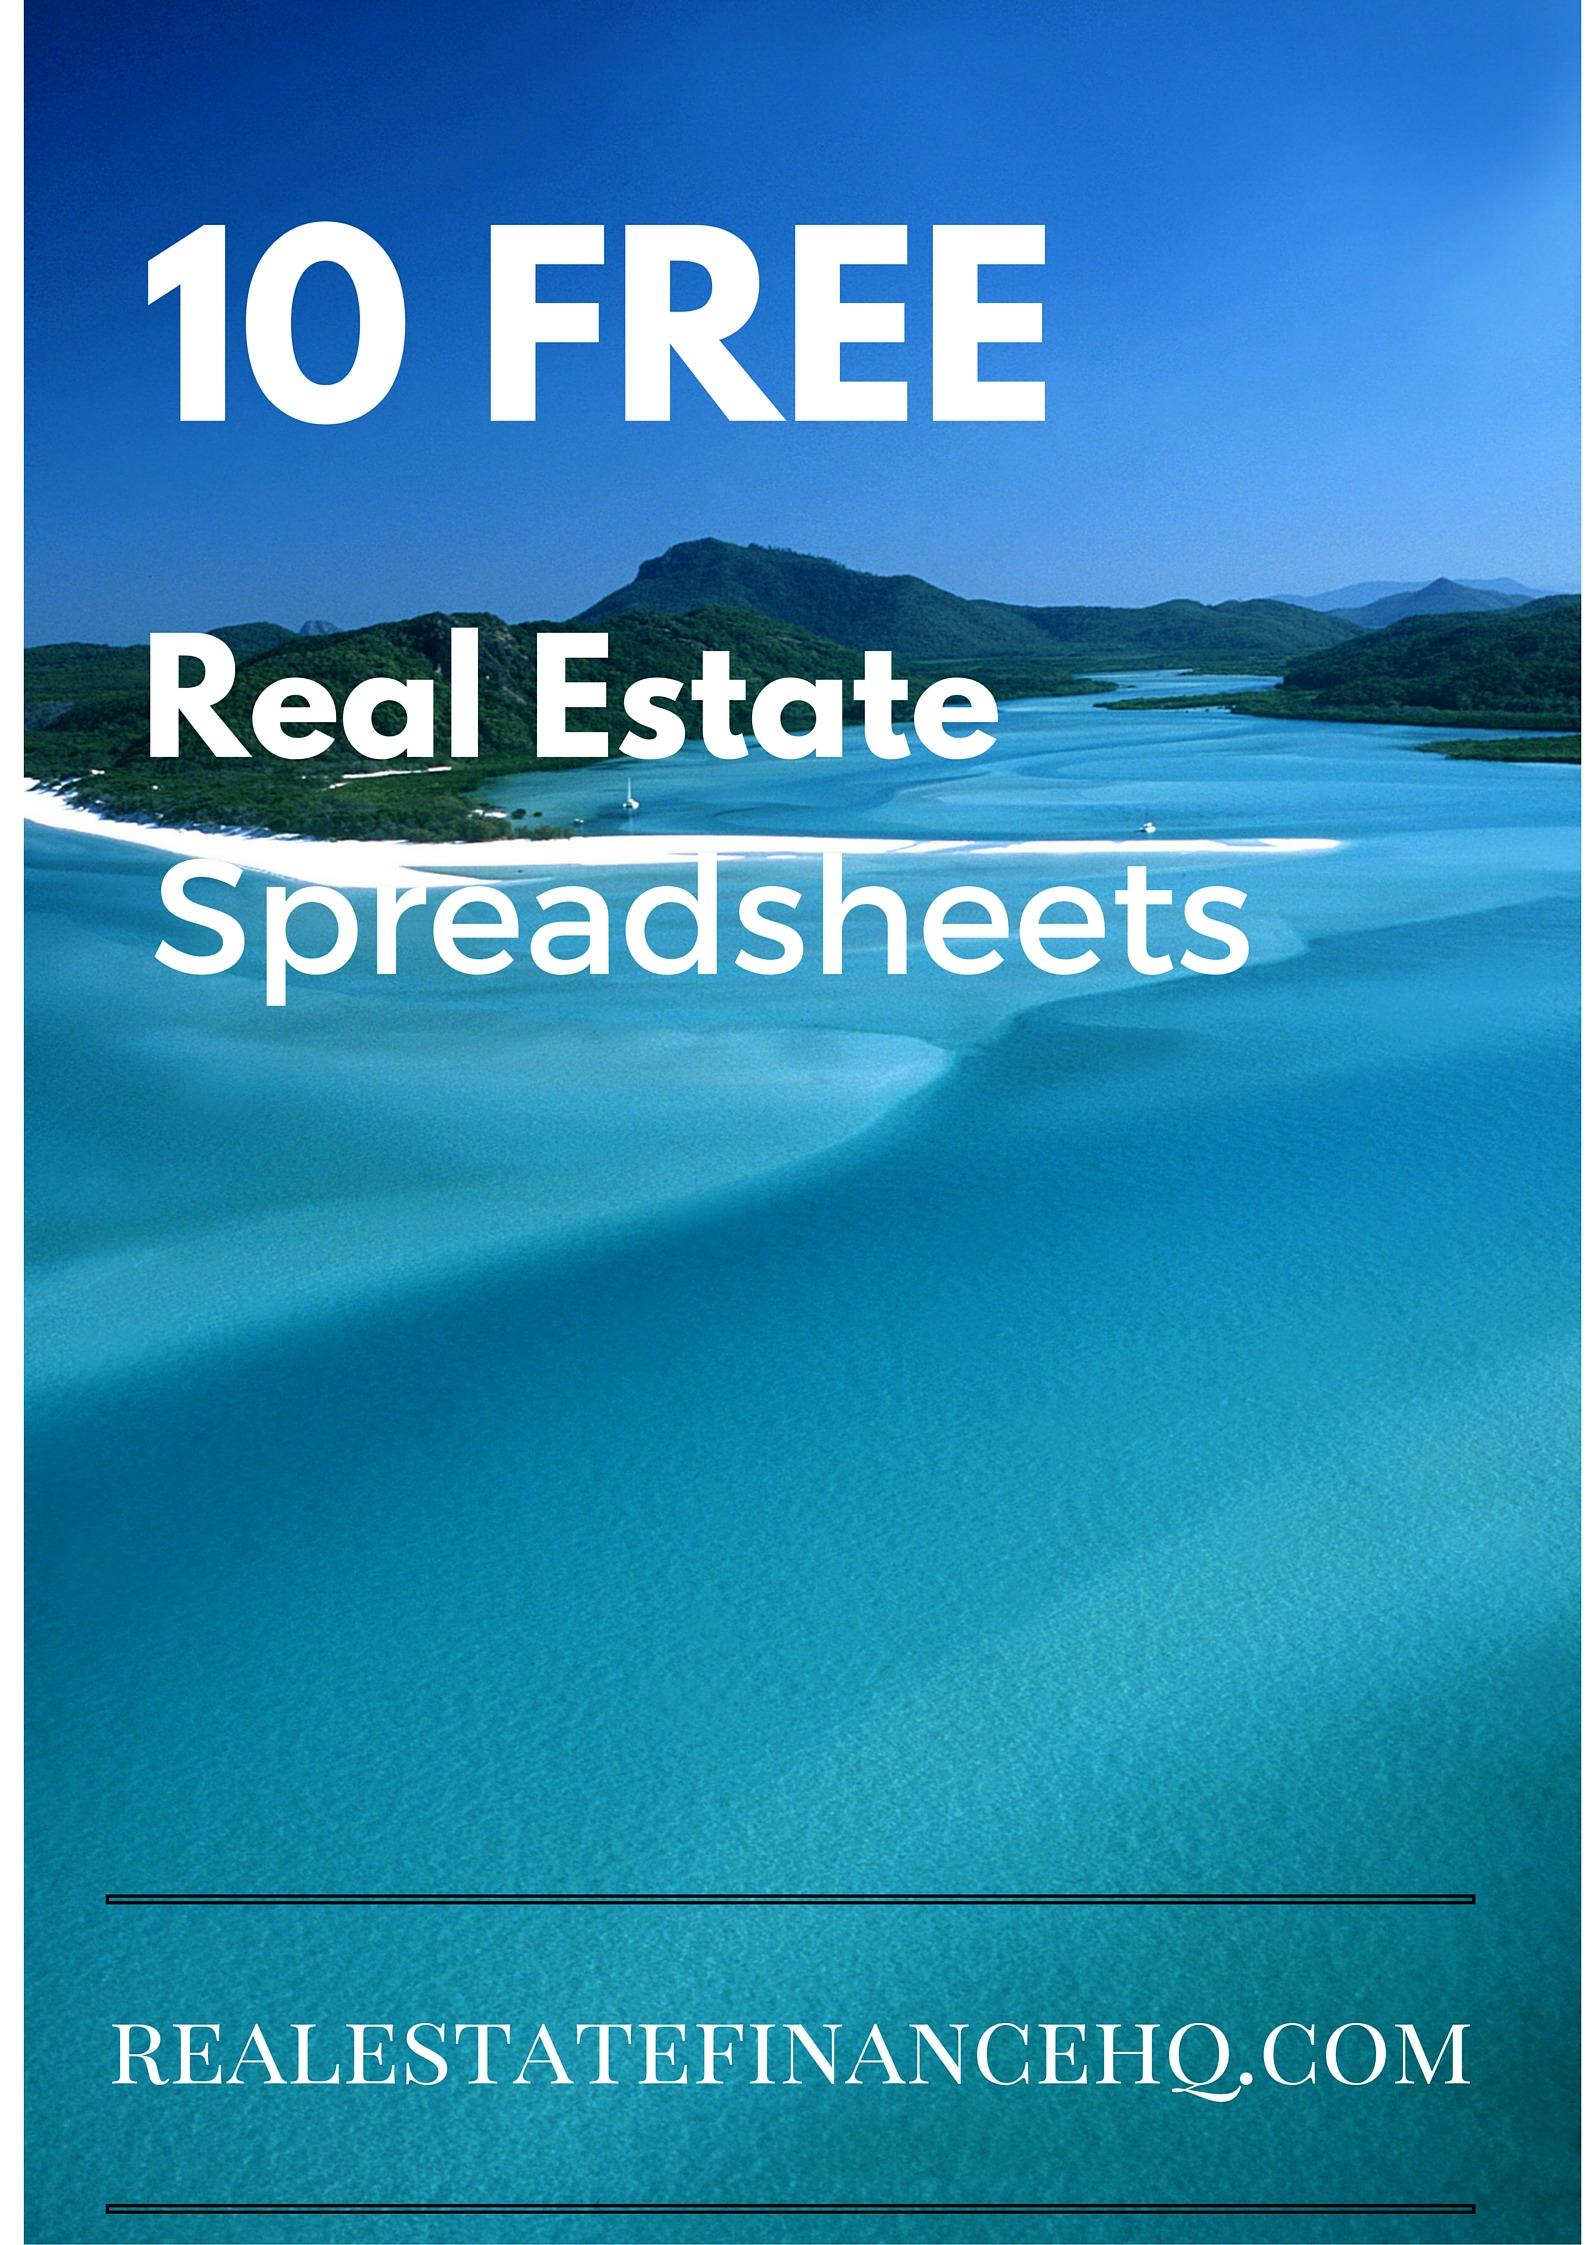 House Flip Spreadsheet Worksheet In 10 Free Real Estate Spreadsheets  Real Estate Finance